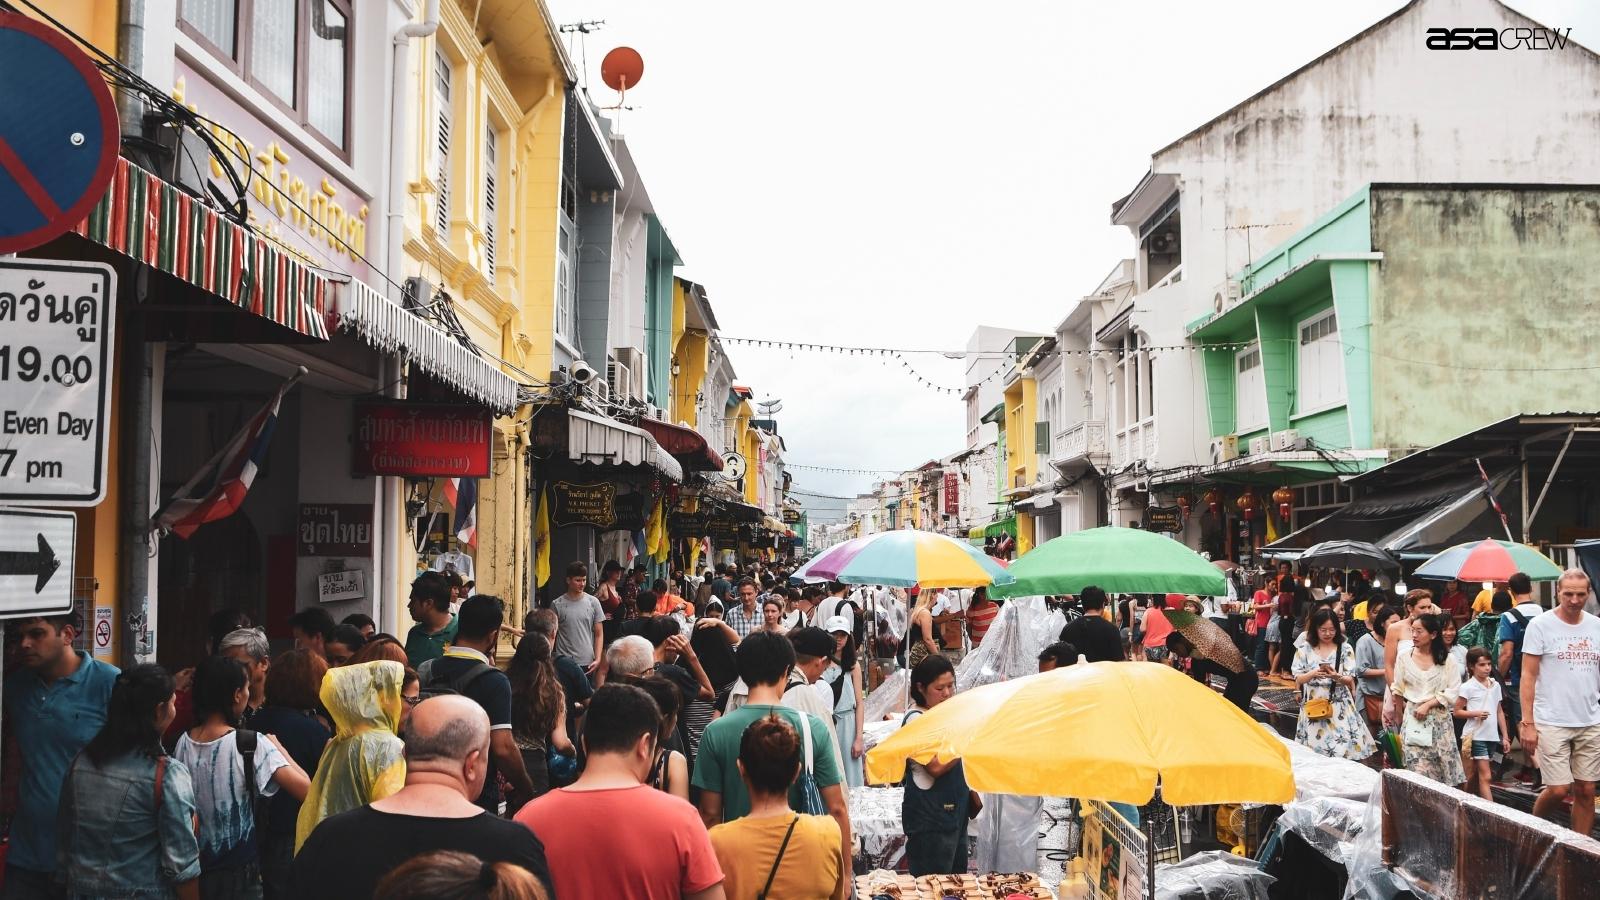 ASA EXPO 2020 นิทรรศการเครือข่ายมรดก การอนุรักษ์และพัฒนาเมืองเก่าต้องมาจากการมีส่วนร่วม